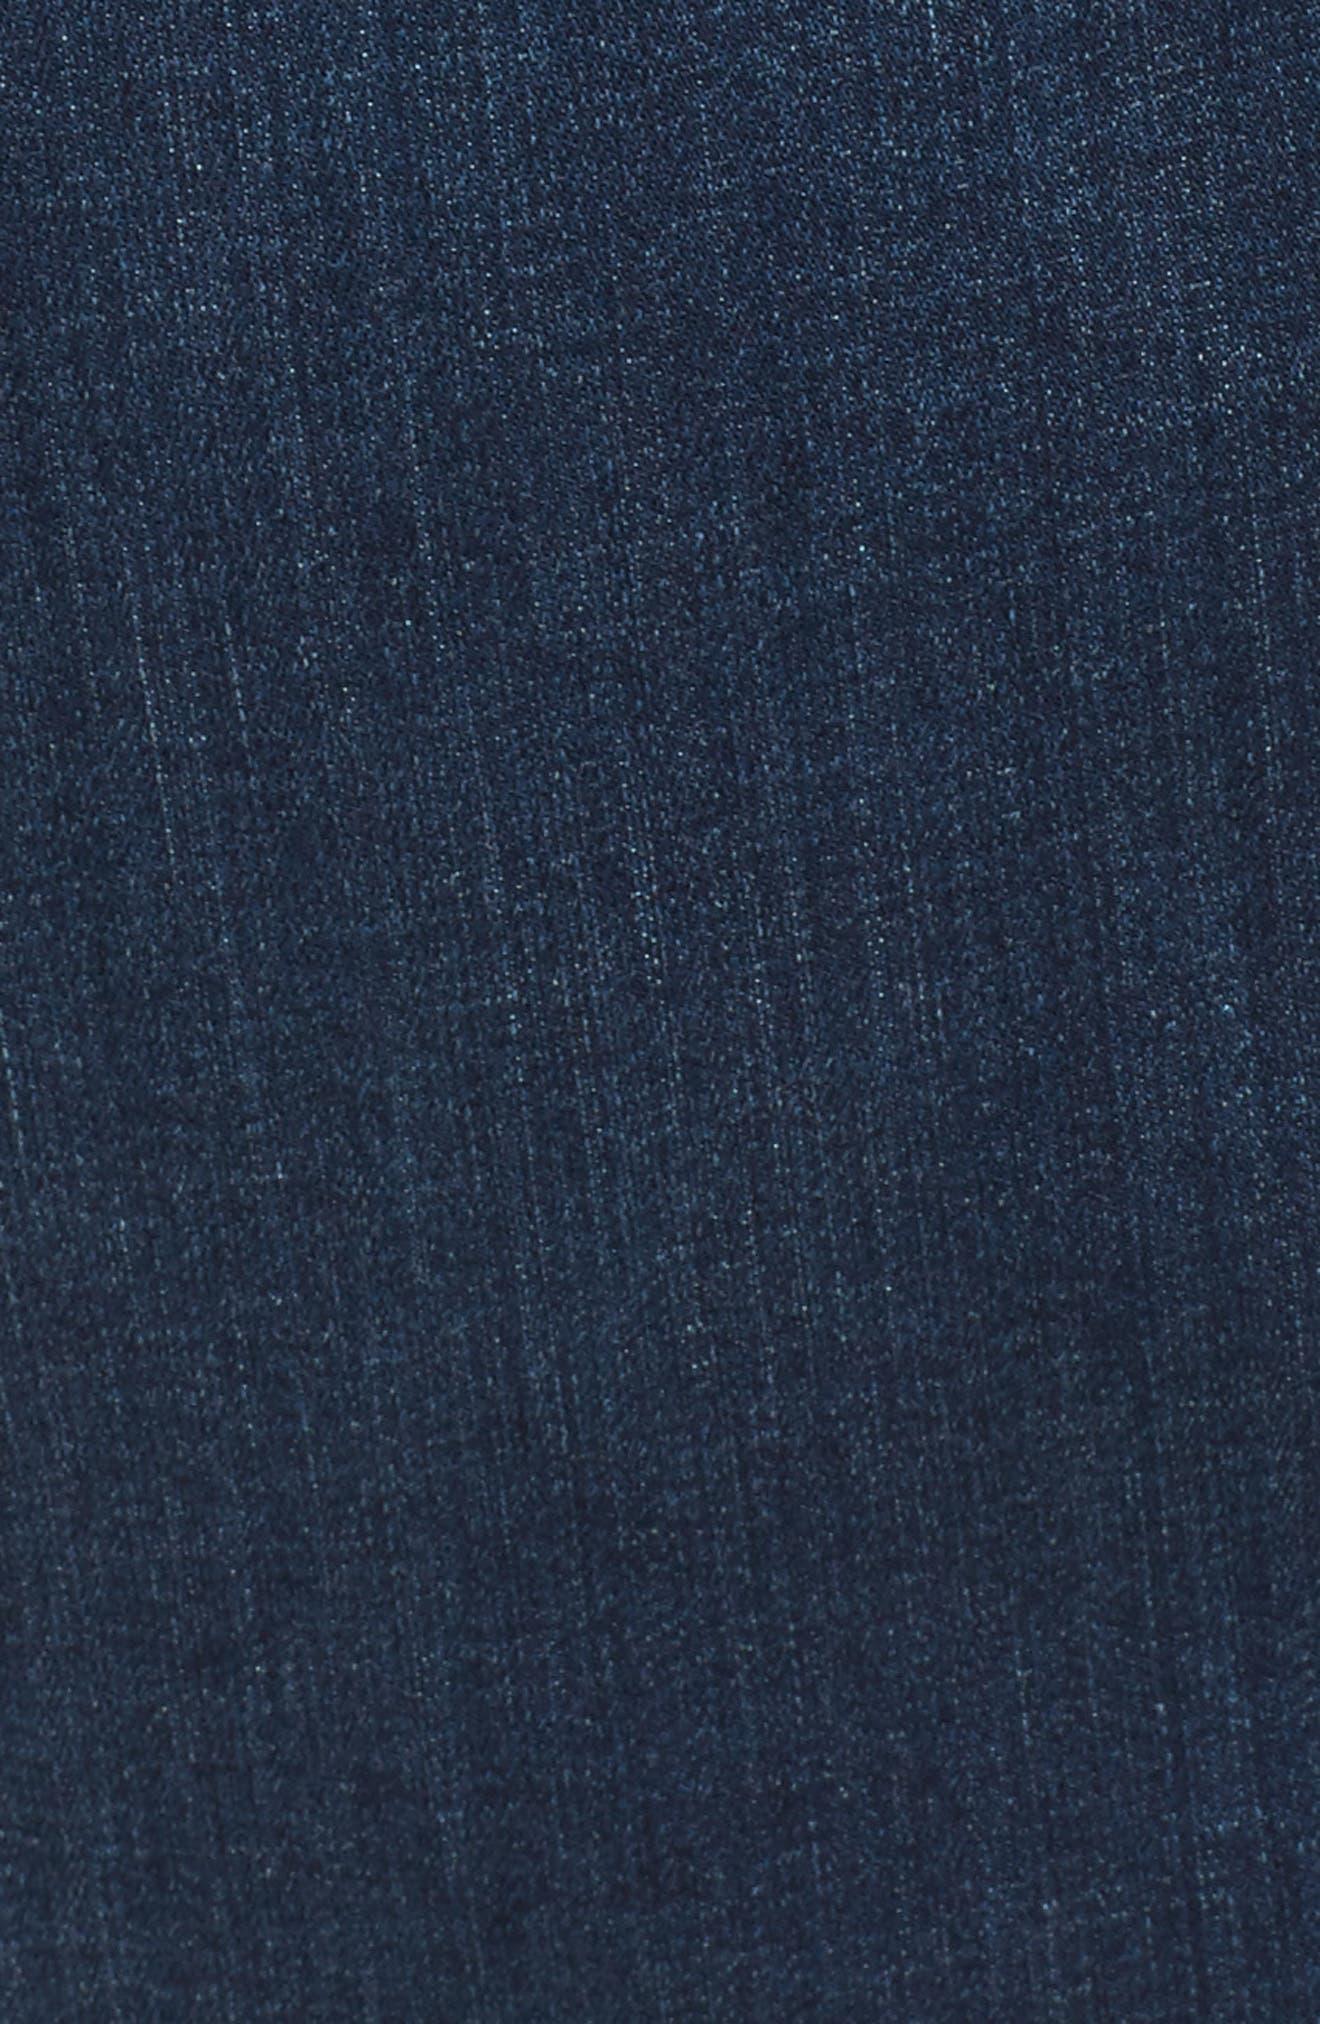 Denim Body-Con Dress,                             Alternate thumbnail 6, color,                             401